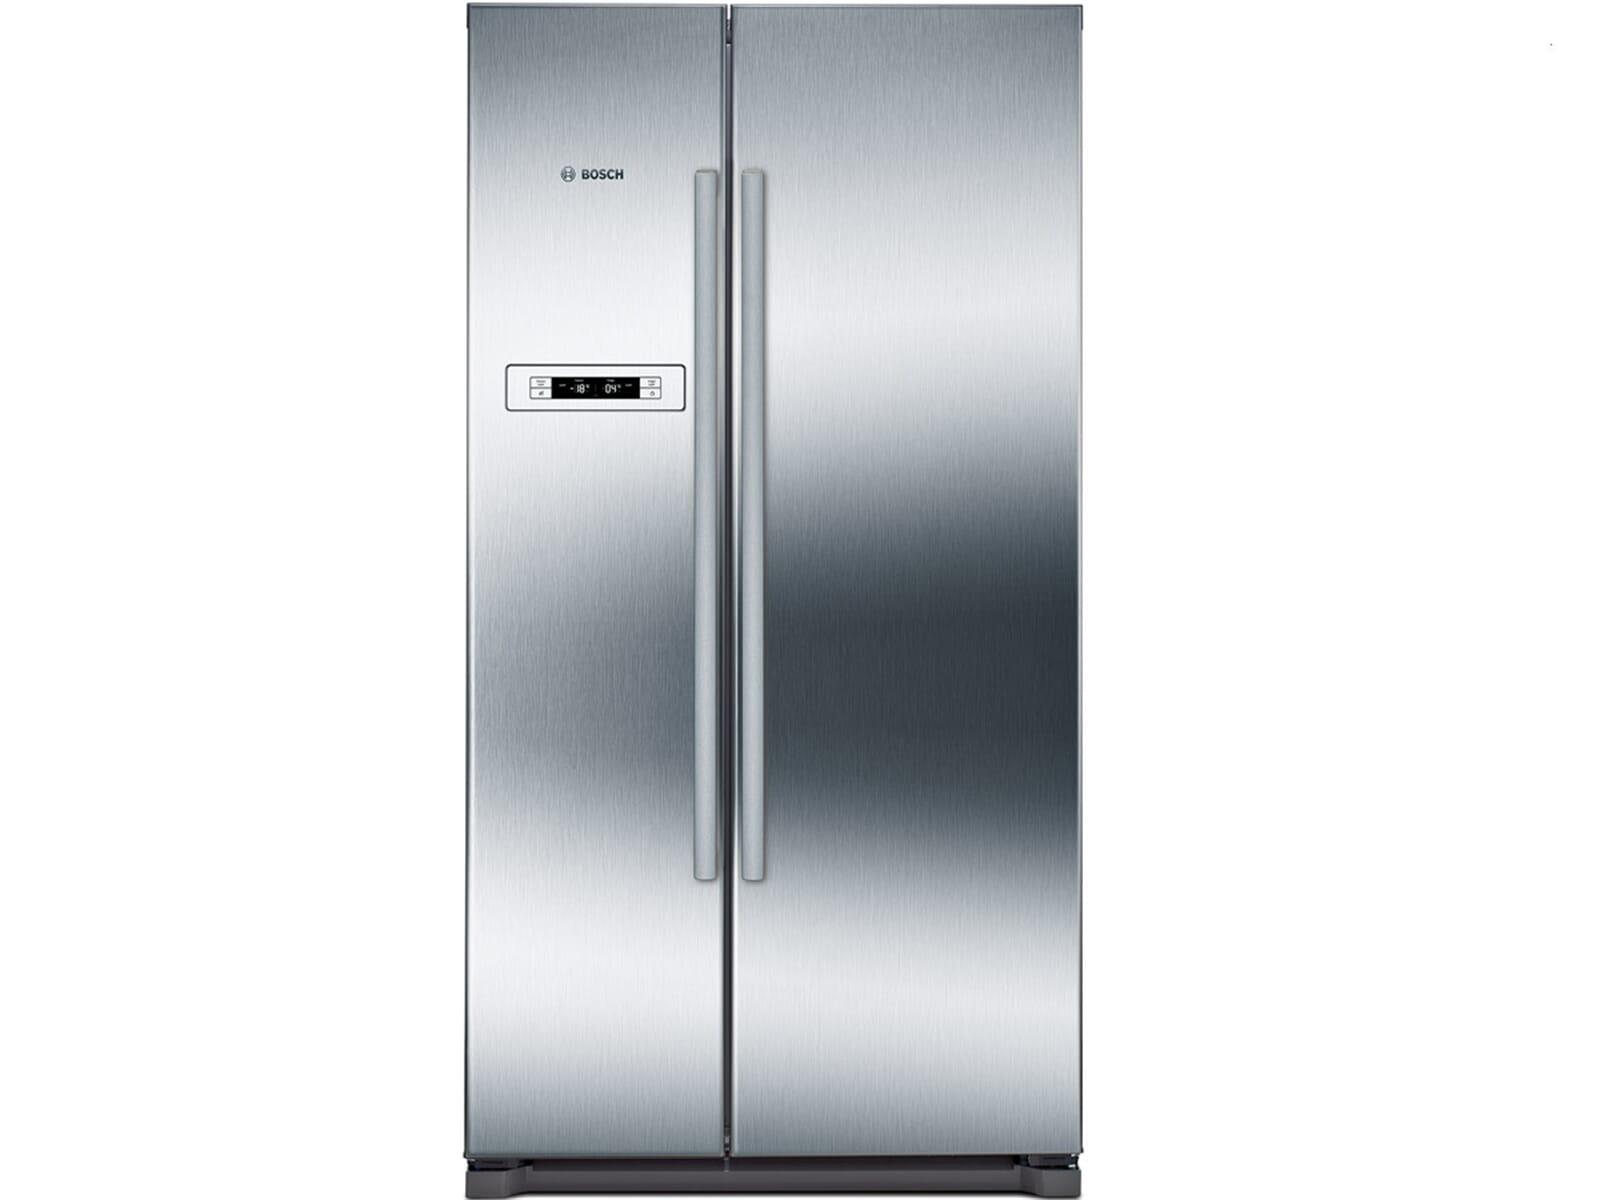 Bosch Kühlschrank Urlaubsschaltung : Bosch kan vi side by side kühl gefrier kombination edelstahl